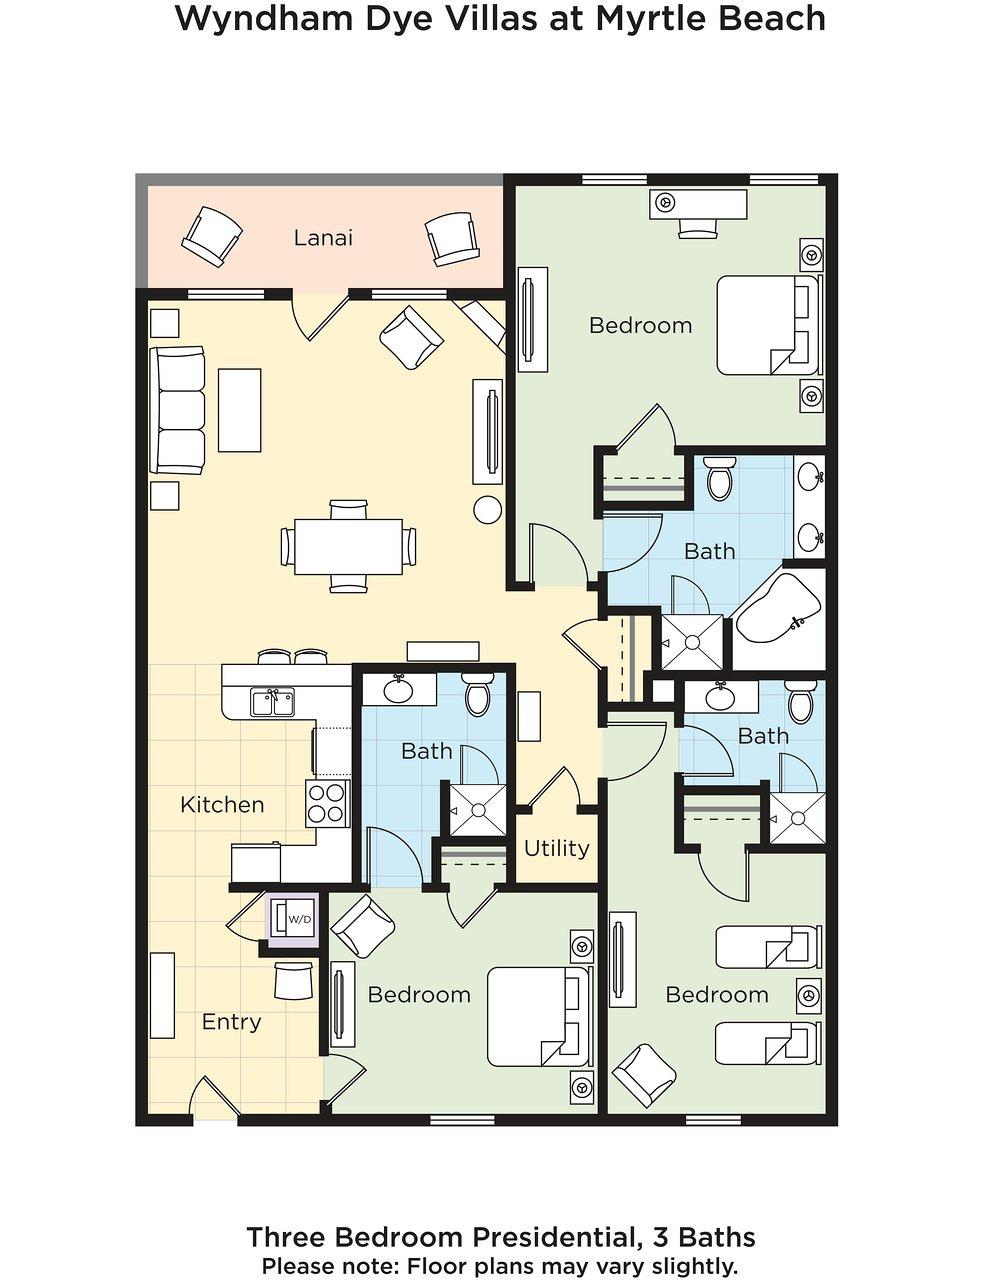 Club Wyndham Dye Villas Prices